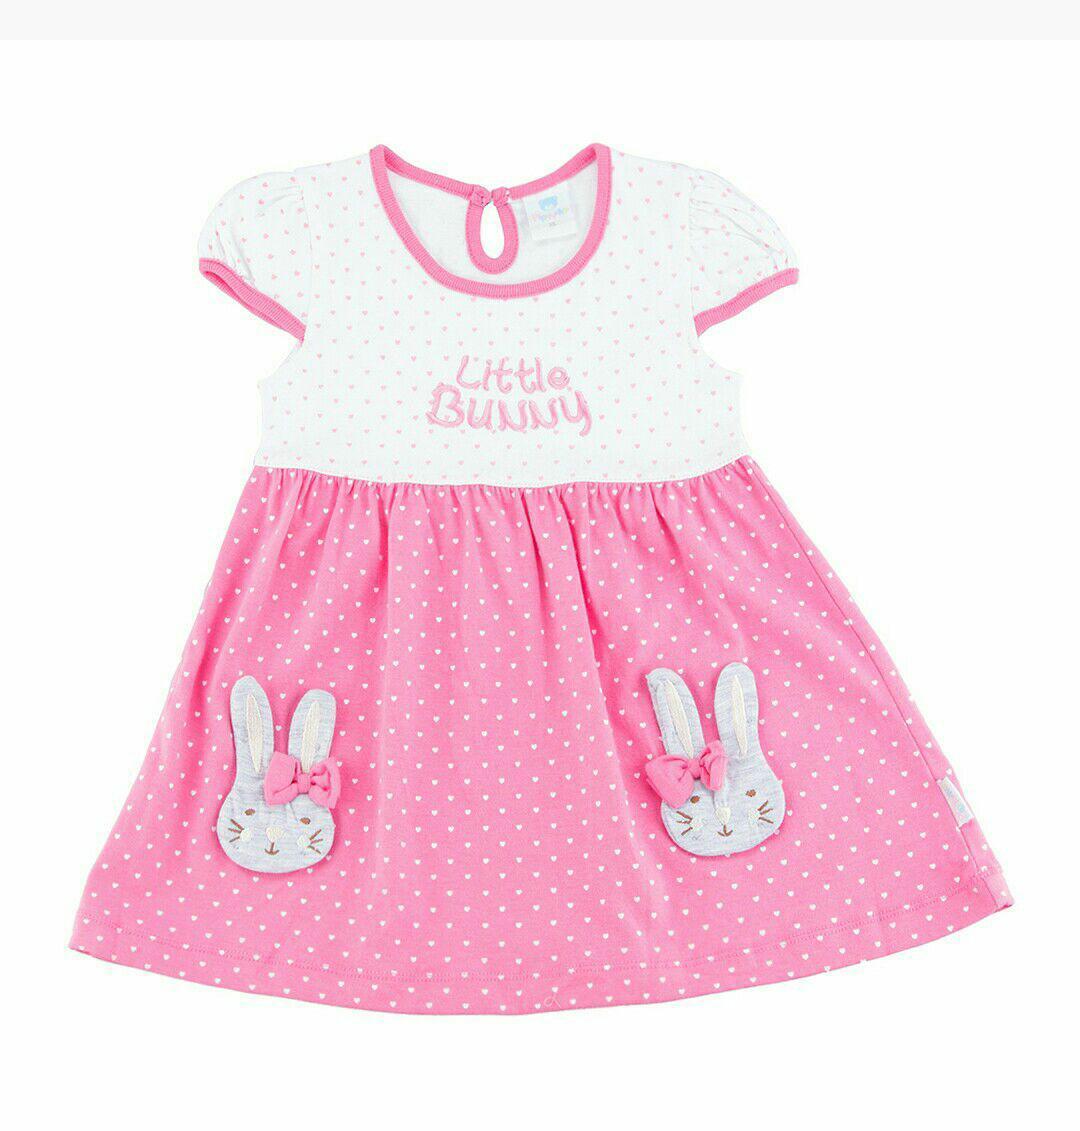 Pipiniko Dress Little Bunny Size XL